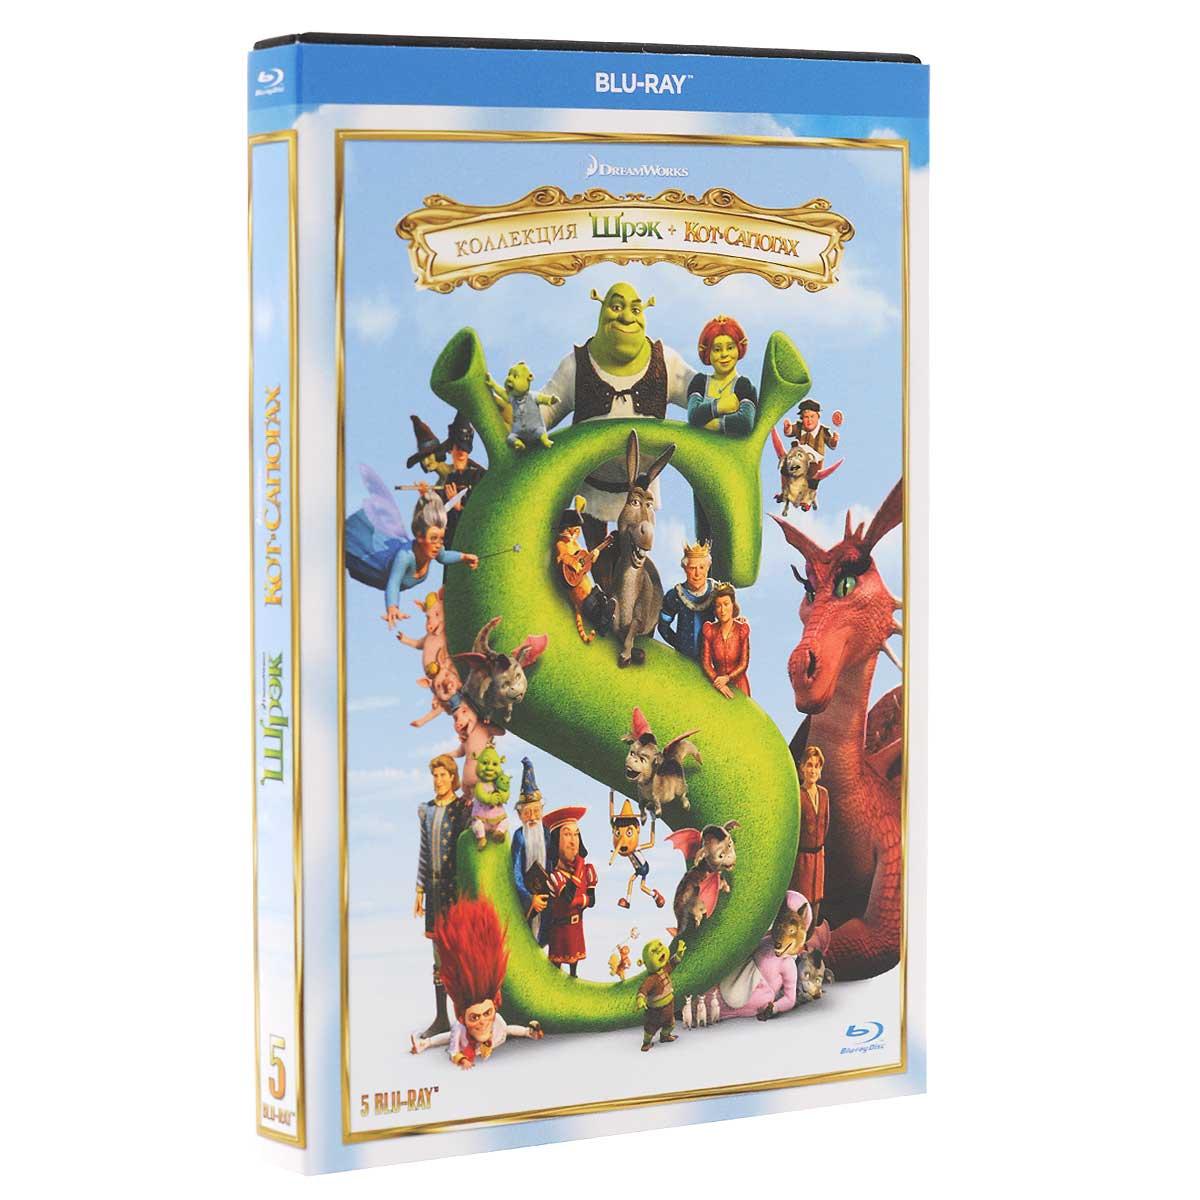 Коллекция: Шрэк / Шрэк 2 / Шрэк Третий / Шрэк навсегда / Кот в сапогах (5 Blu-ray)